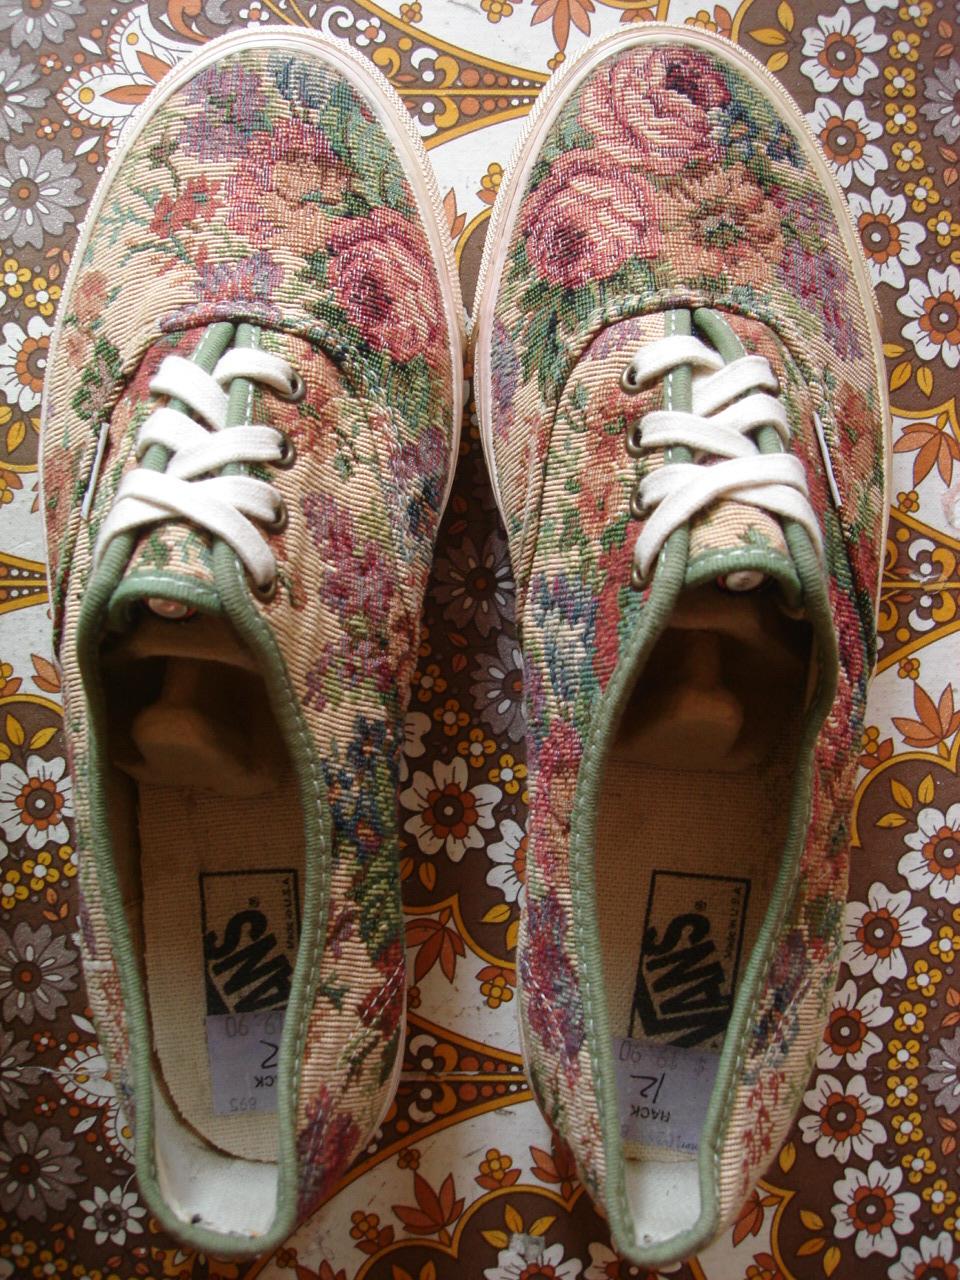 theothersideofthepillow: vintage VANS shoes FLORAL TEA ... Vans Shoes